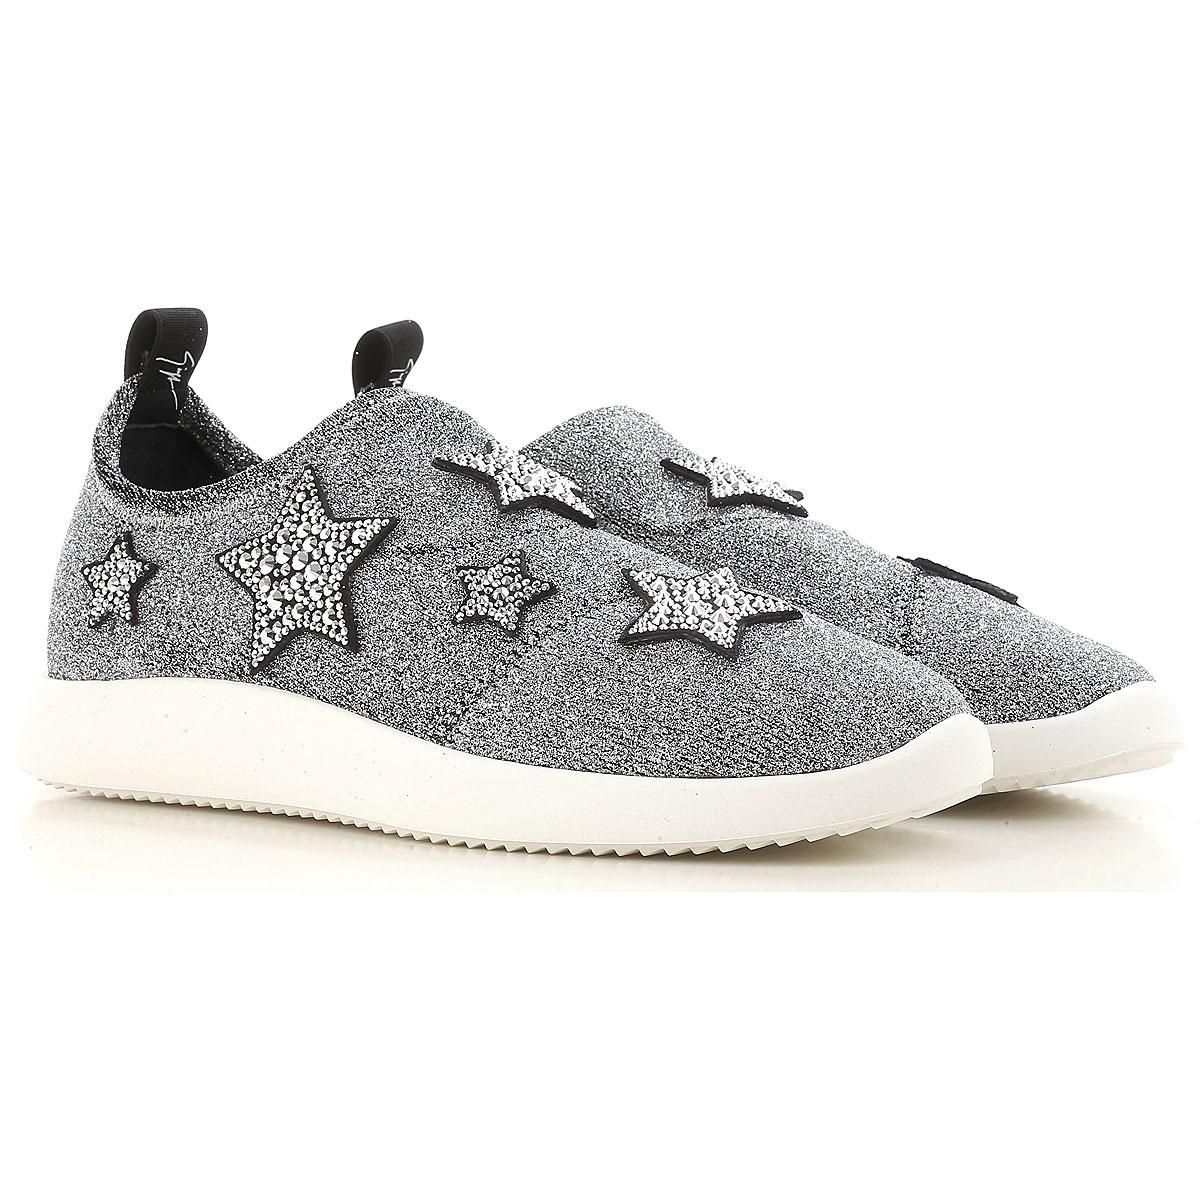 Giuseppe Zanotti Design Sneakers for Women On Sale in Outlet, Silver, Glitter, 2019, 10 7 9